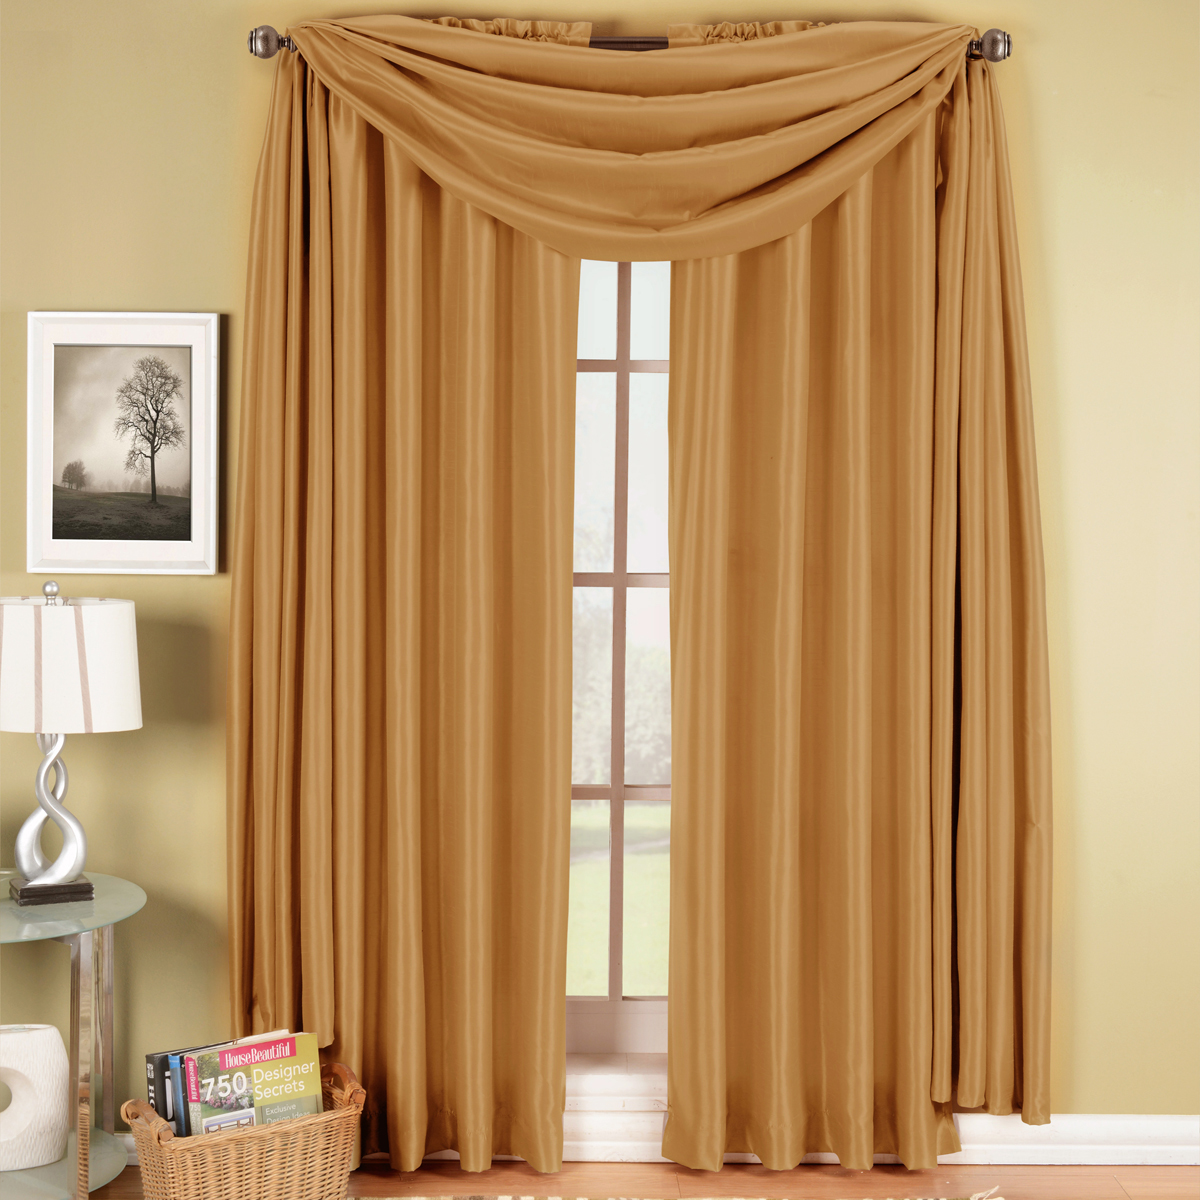 Soho Faux Silk Rod Pocket Window Treatment Panel (Single)- Mushroom - 42x96